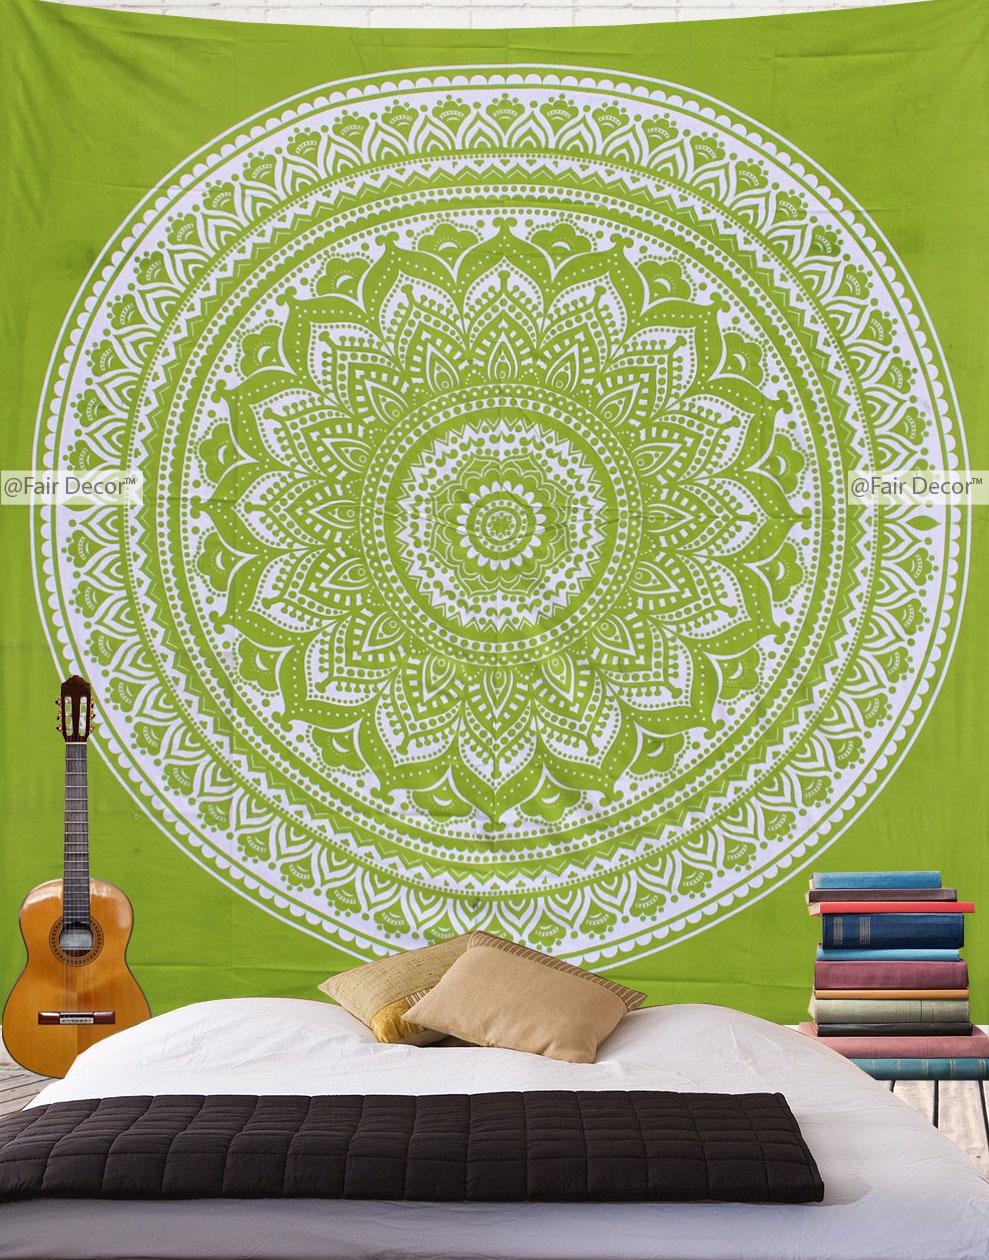 Parrot Green Tapestry - Parrot Green Mandala Beach Tapestry